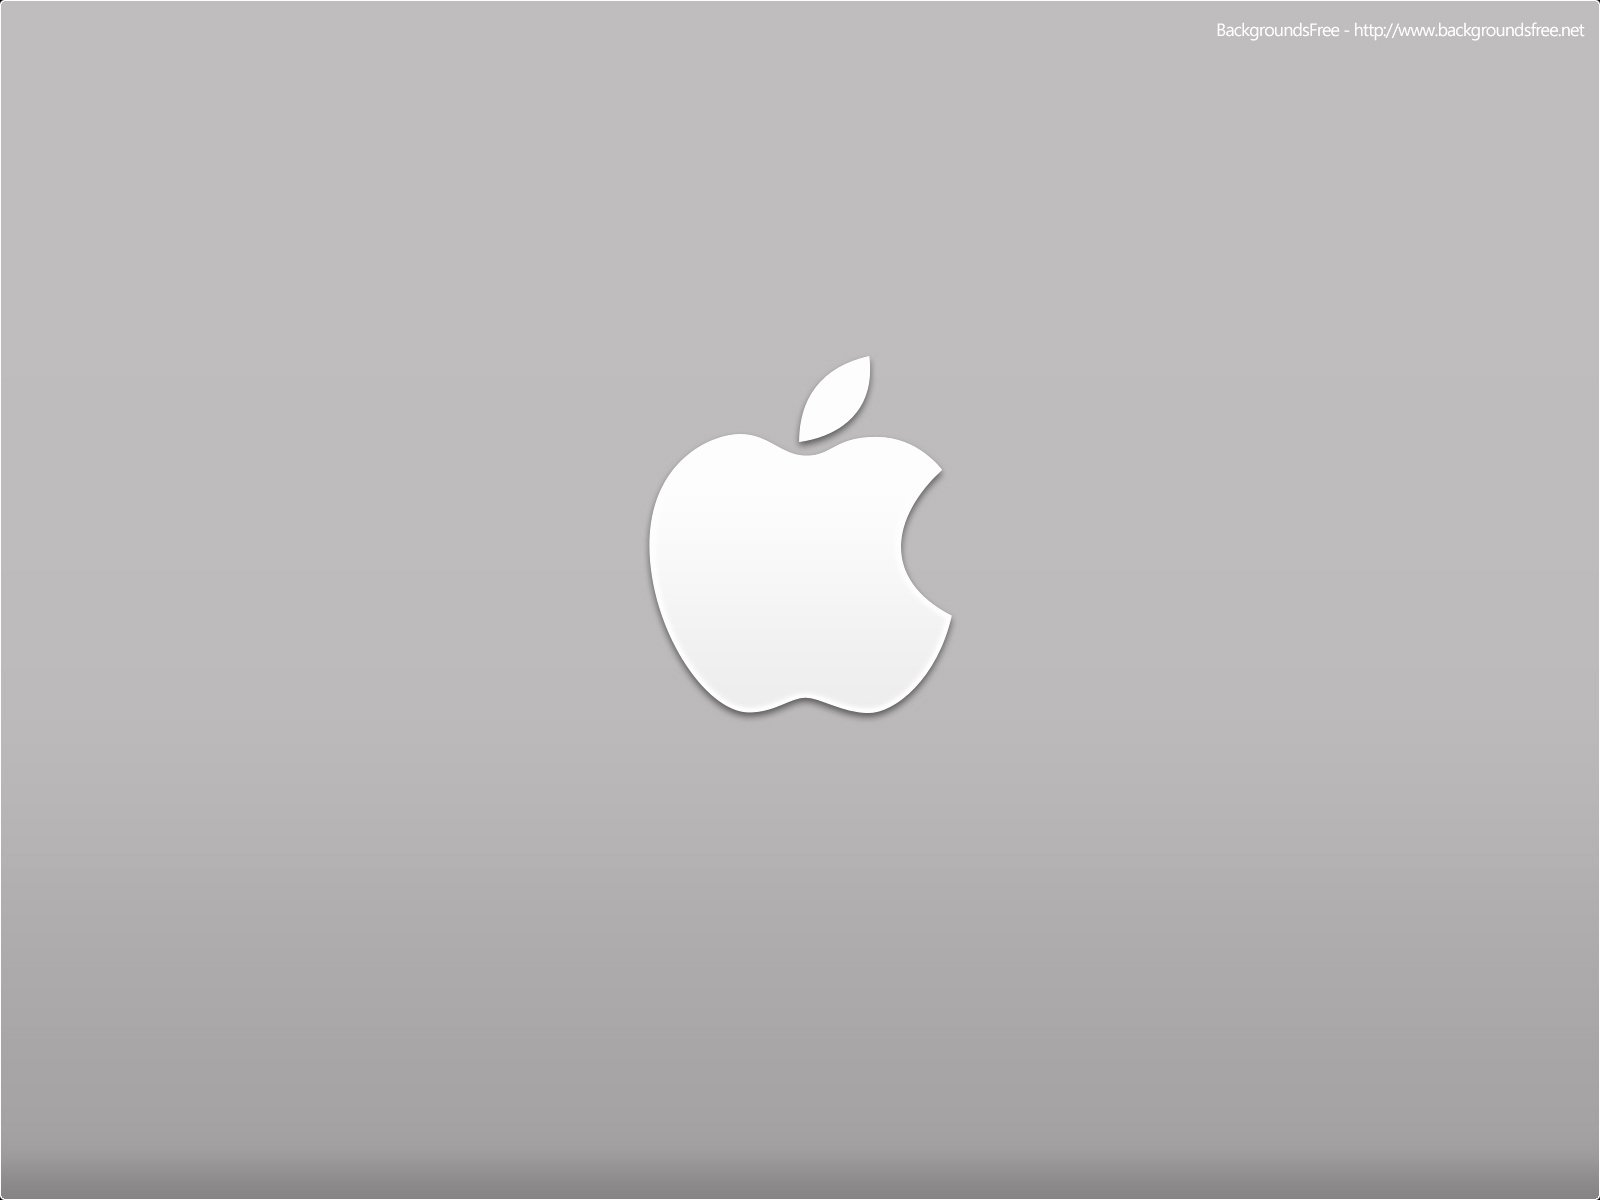 Apple Desktop Logo Backgrounds